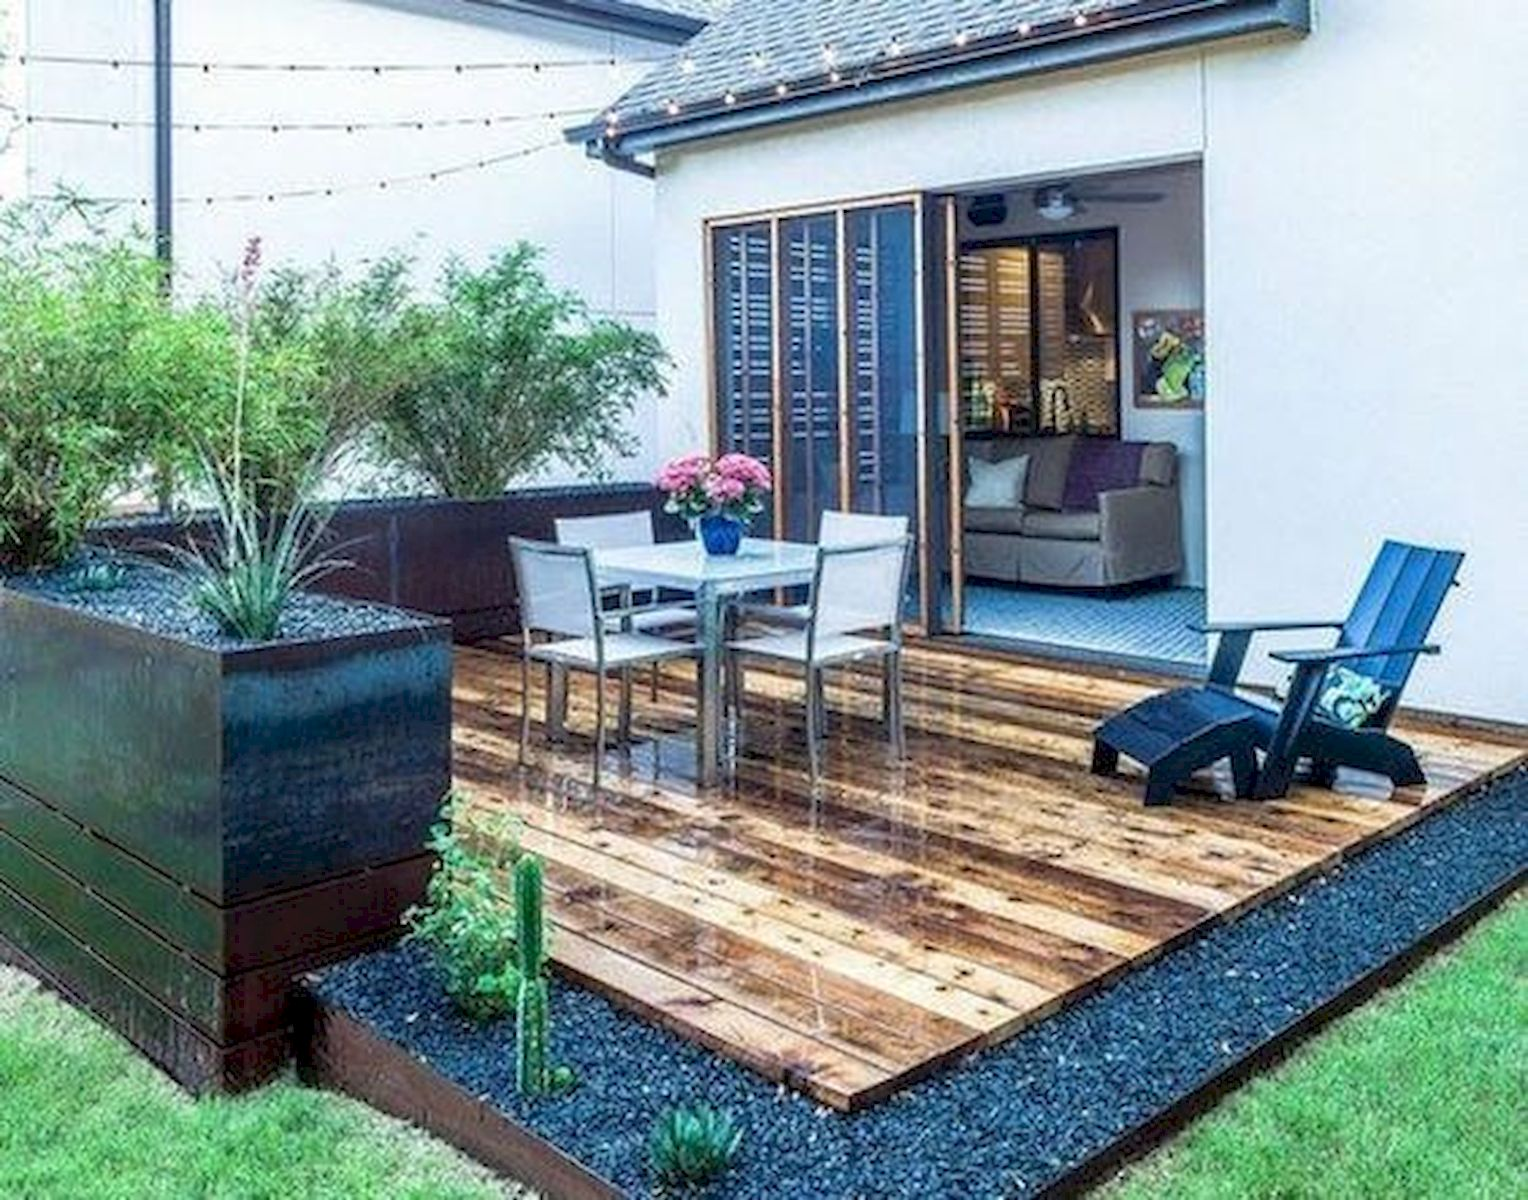 50 Best DIY Backyard Patio and Decking Design Ideas (51)